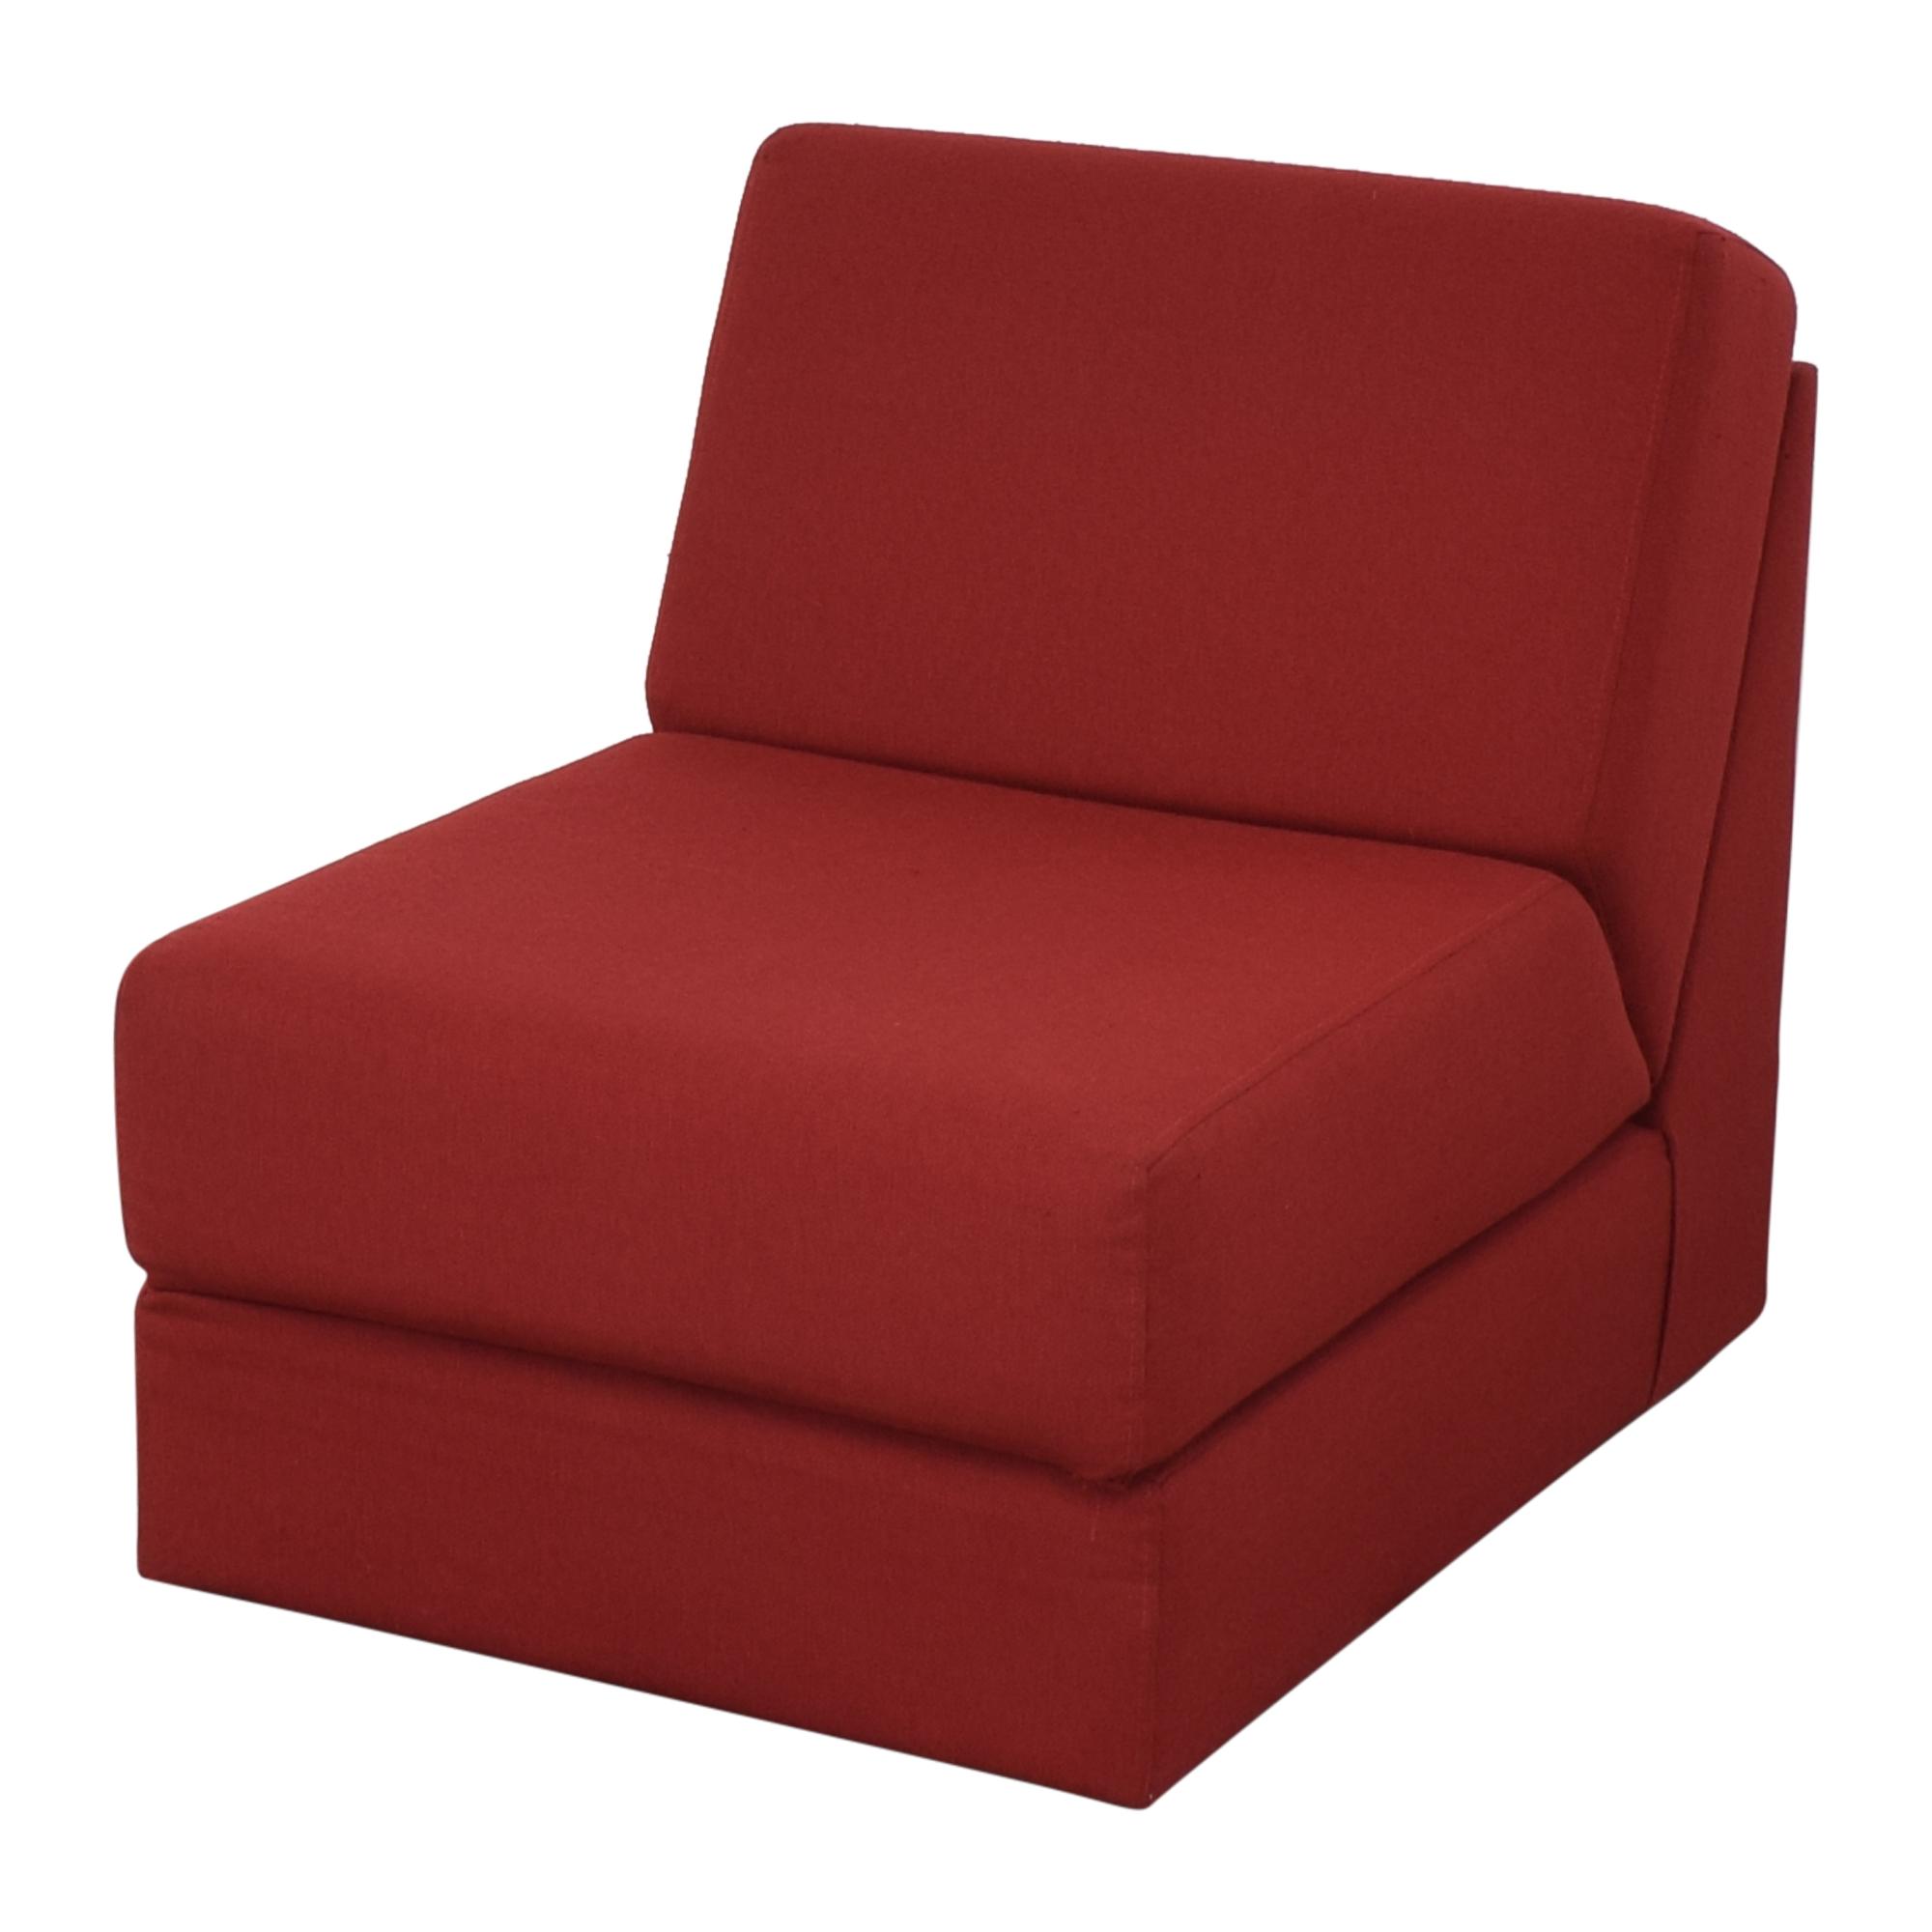 buy Lazzoni Mini Seat Packing Sofa Bed Lazzoni Accent Chairs